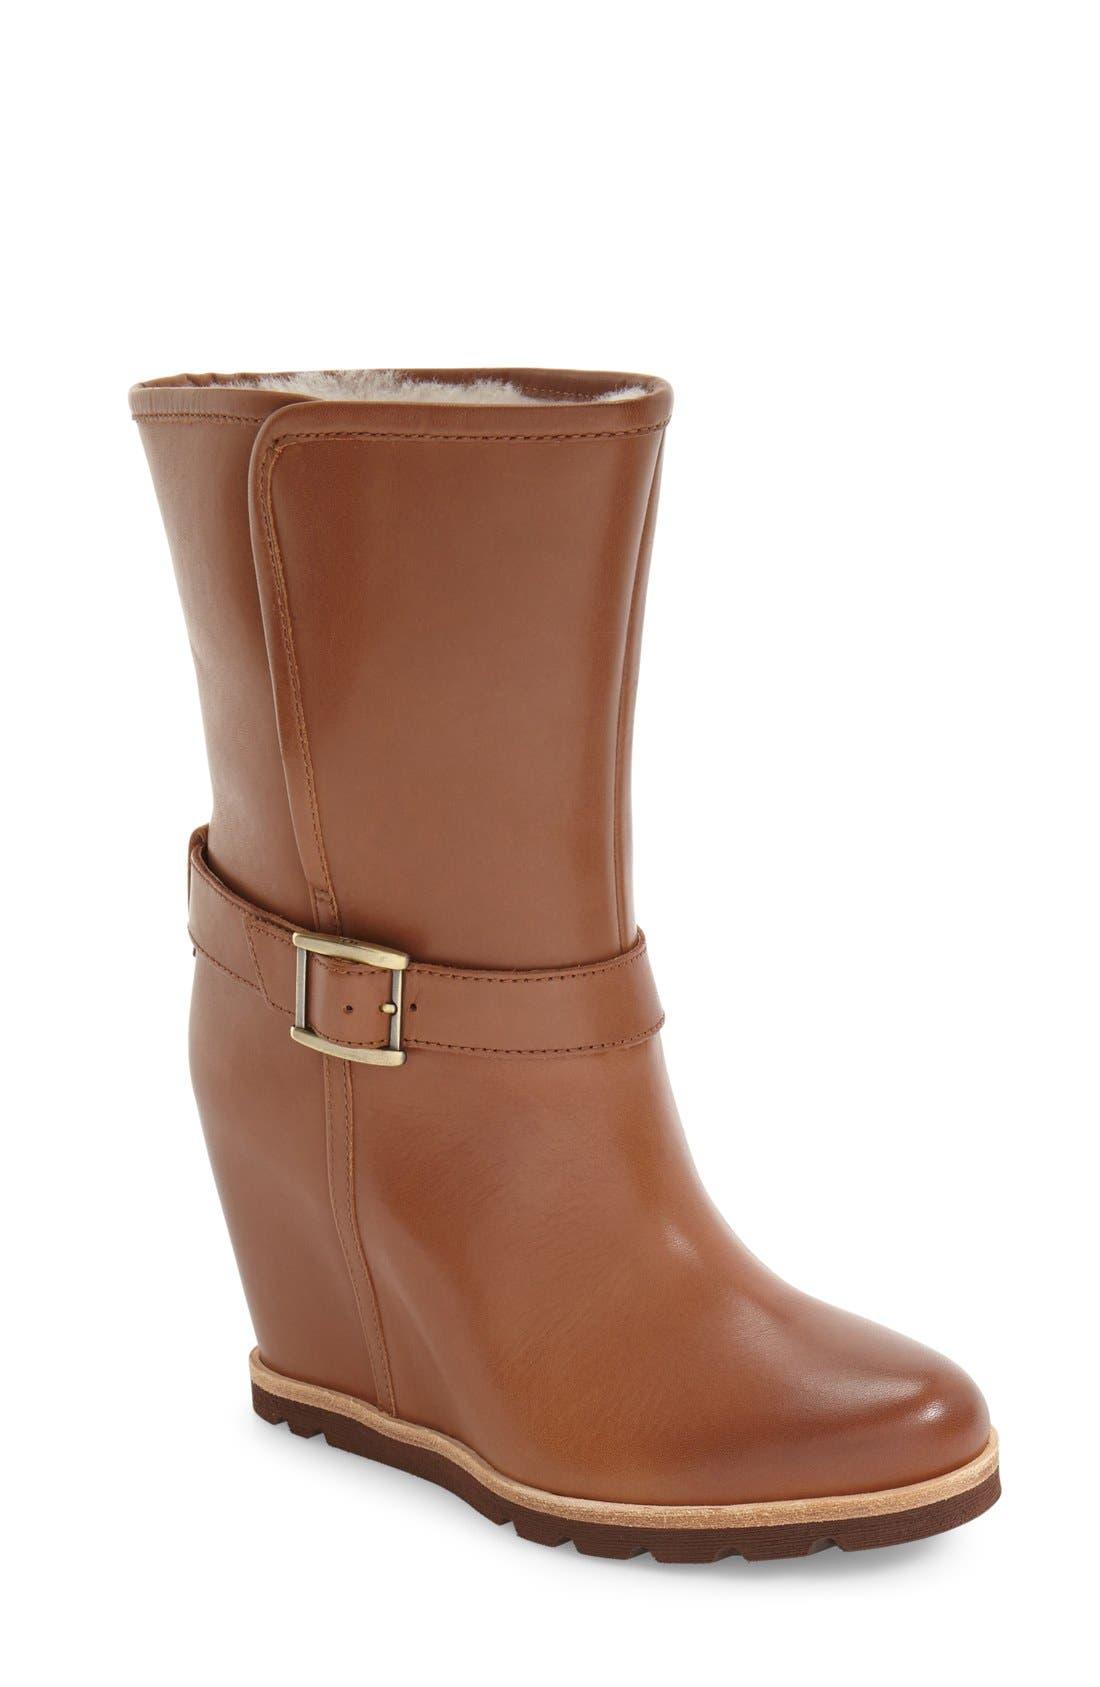 Main Image - UGG® 'Ellecia' Wedge Boot (Women)